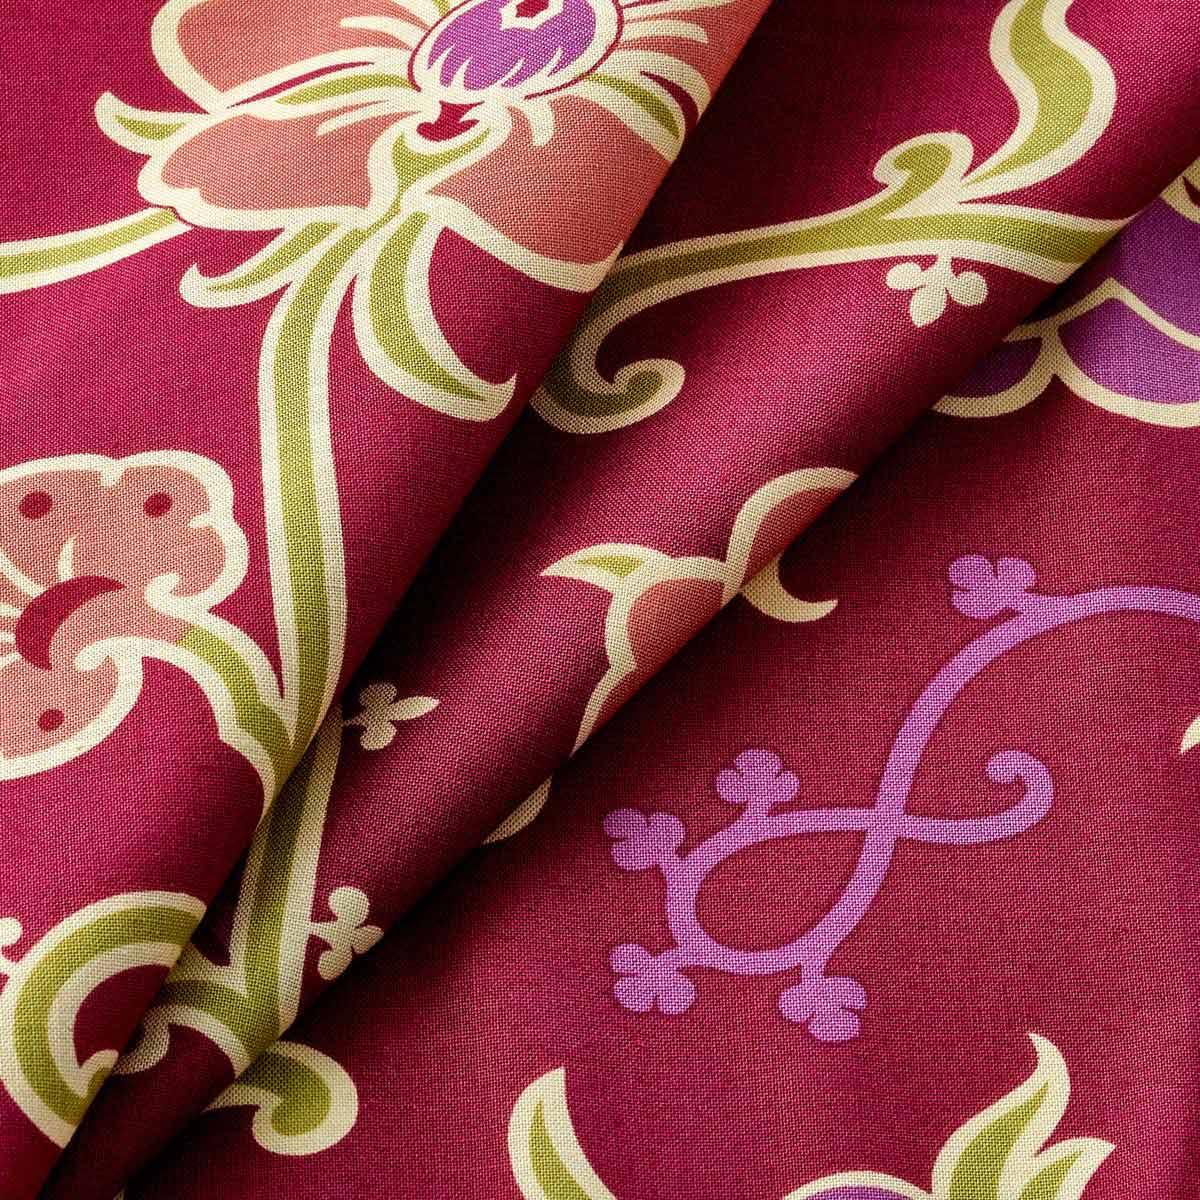 QPWAB089 Grape ROWAN Ткань 100% хл, 50*55см